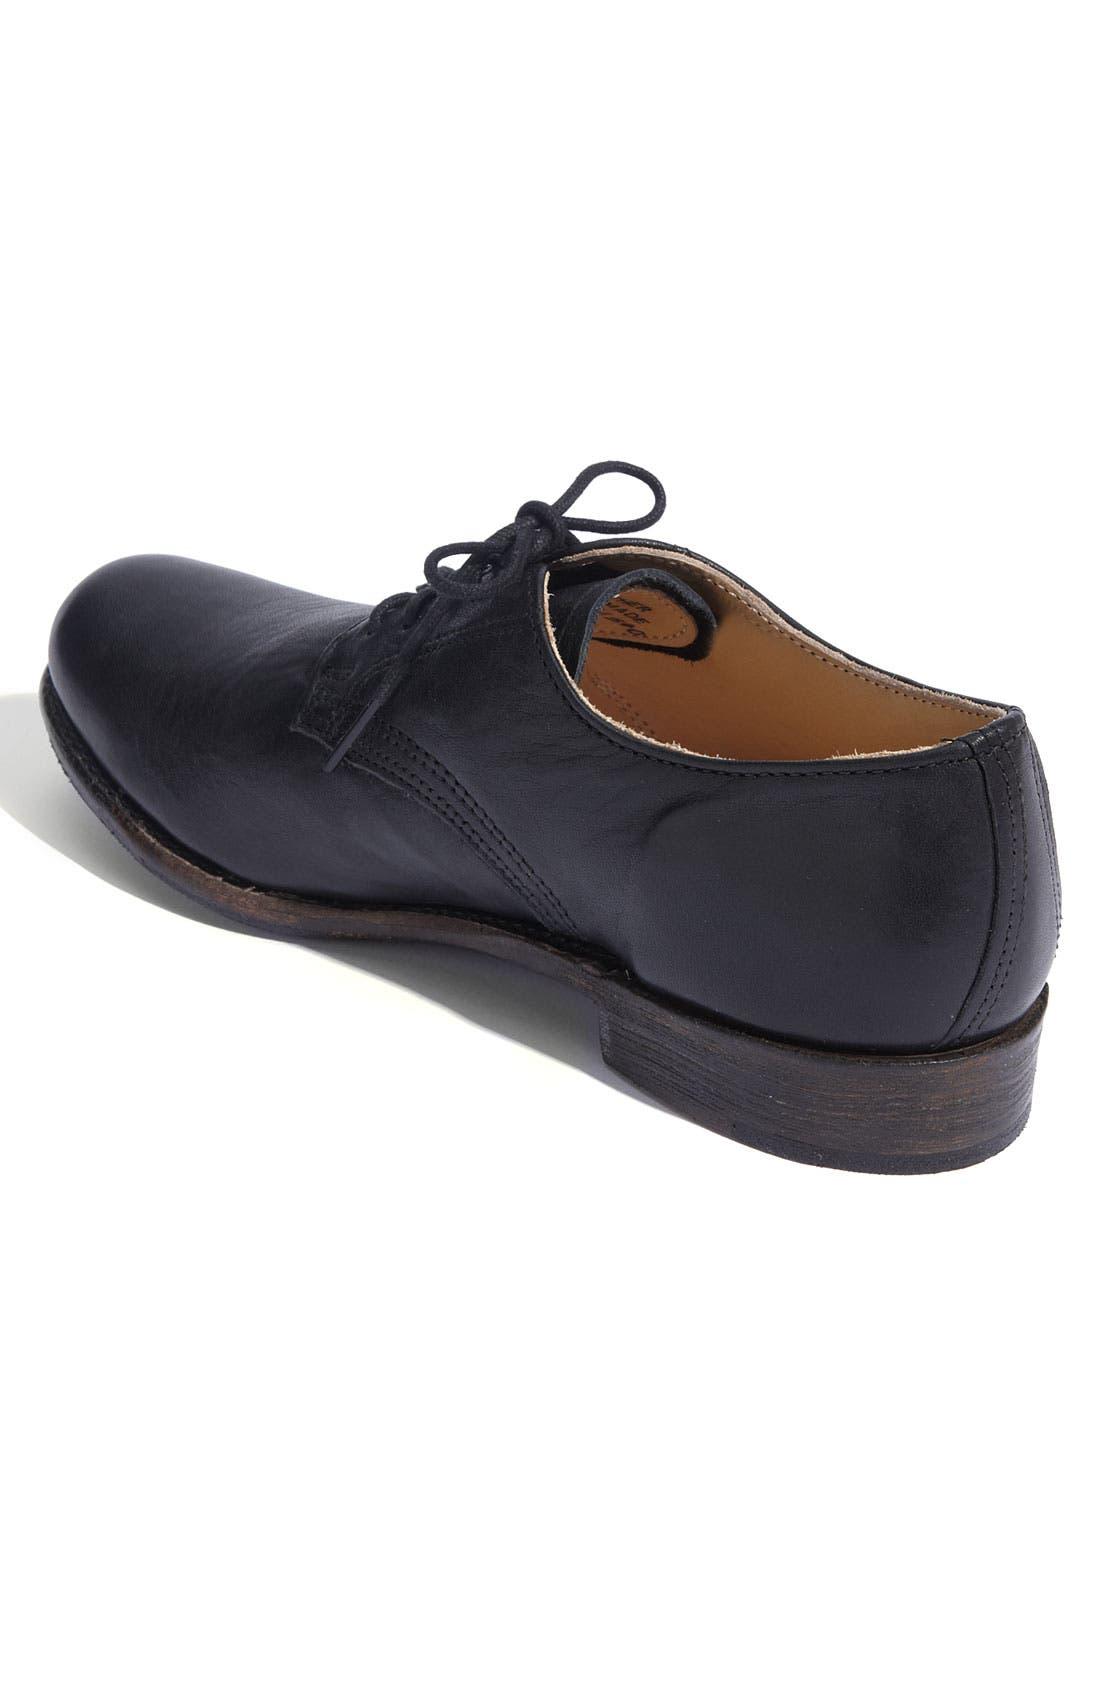 Alternate Image 2  - Vintage Shoe Company 'Judson' Oxford